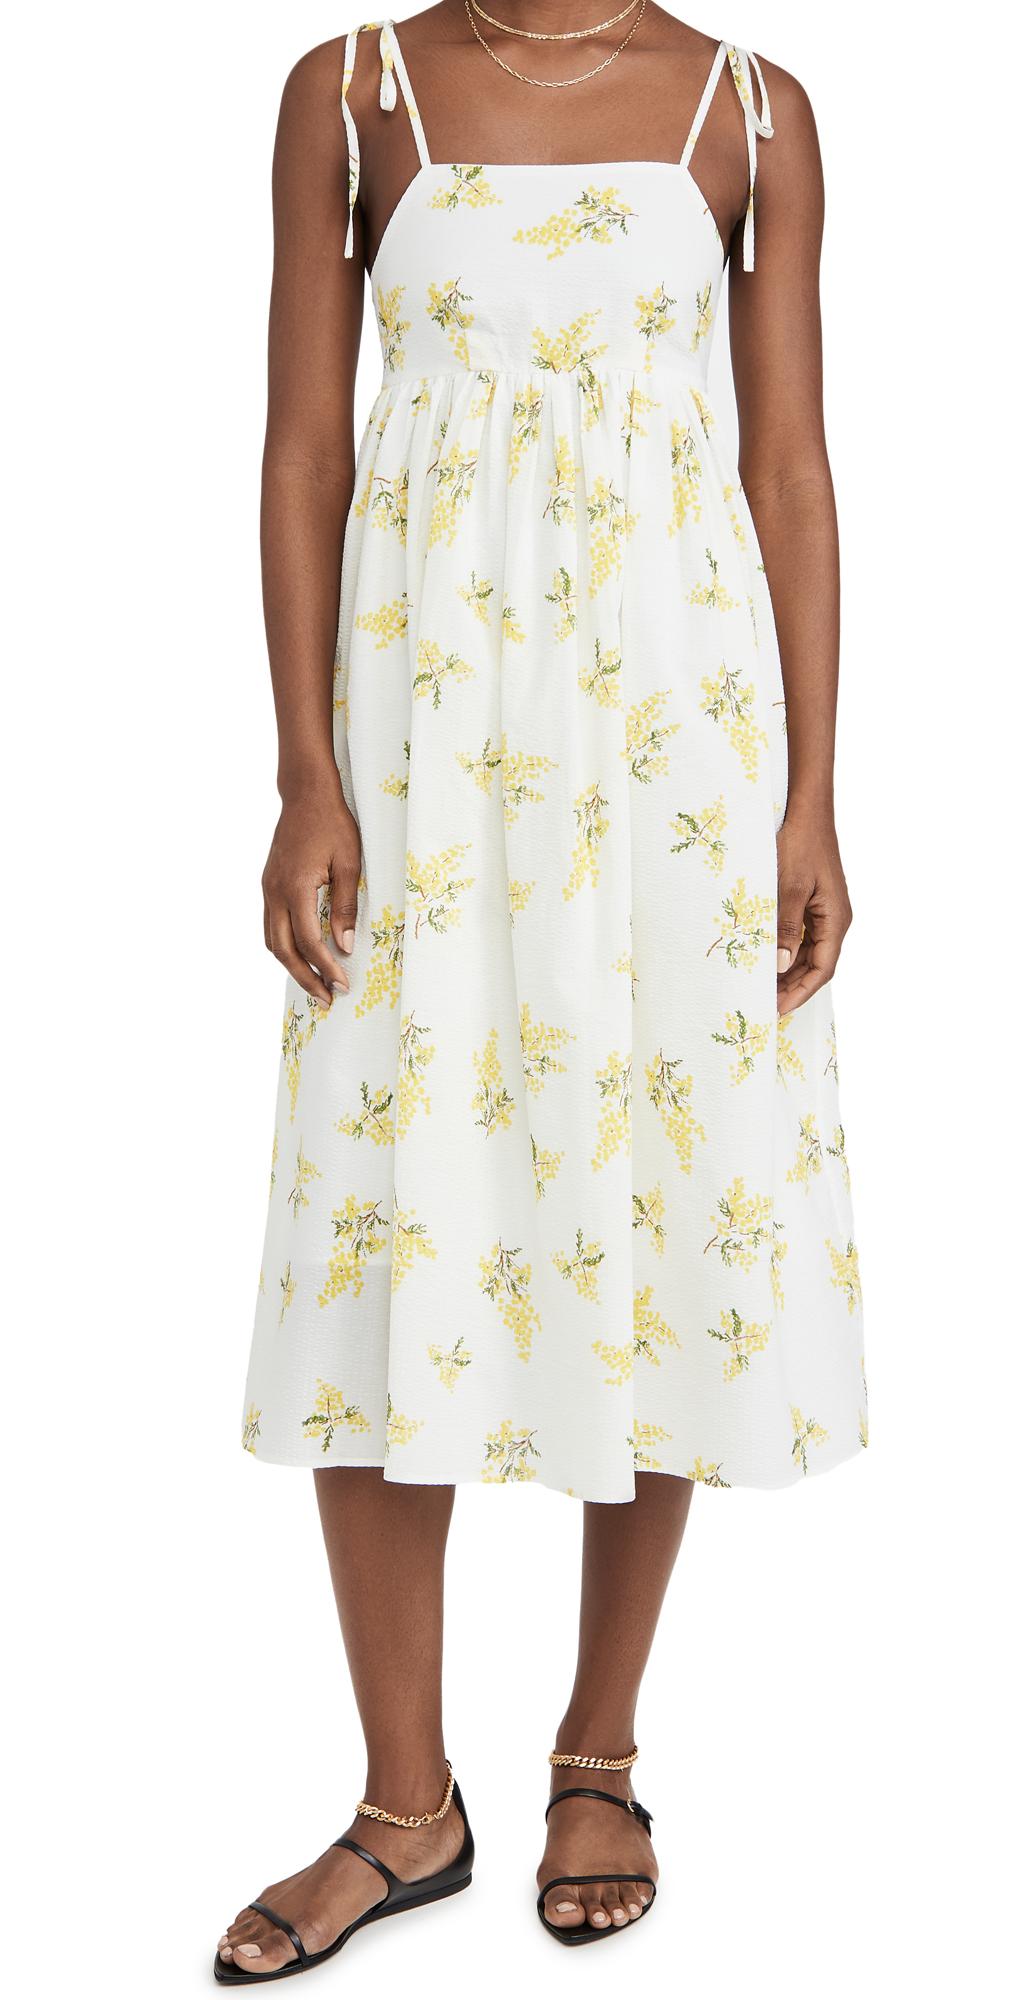 Naya Rea Kira Dress